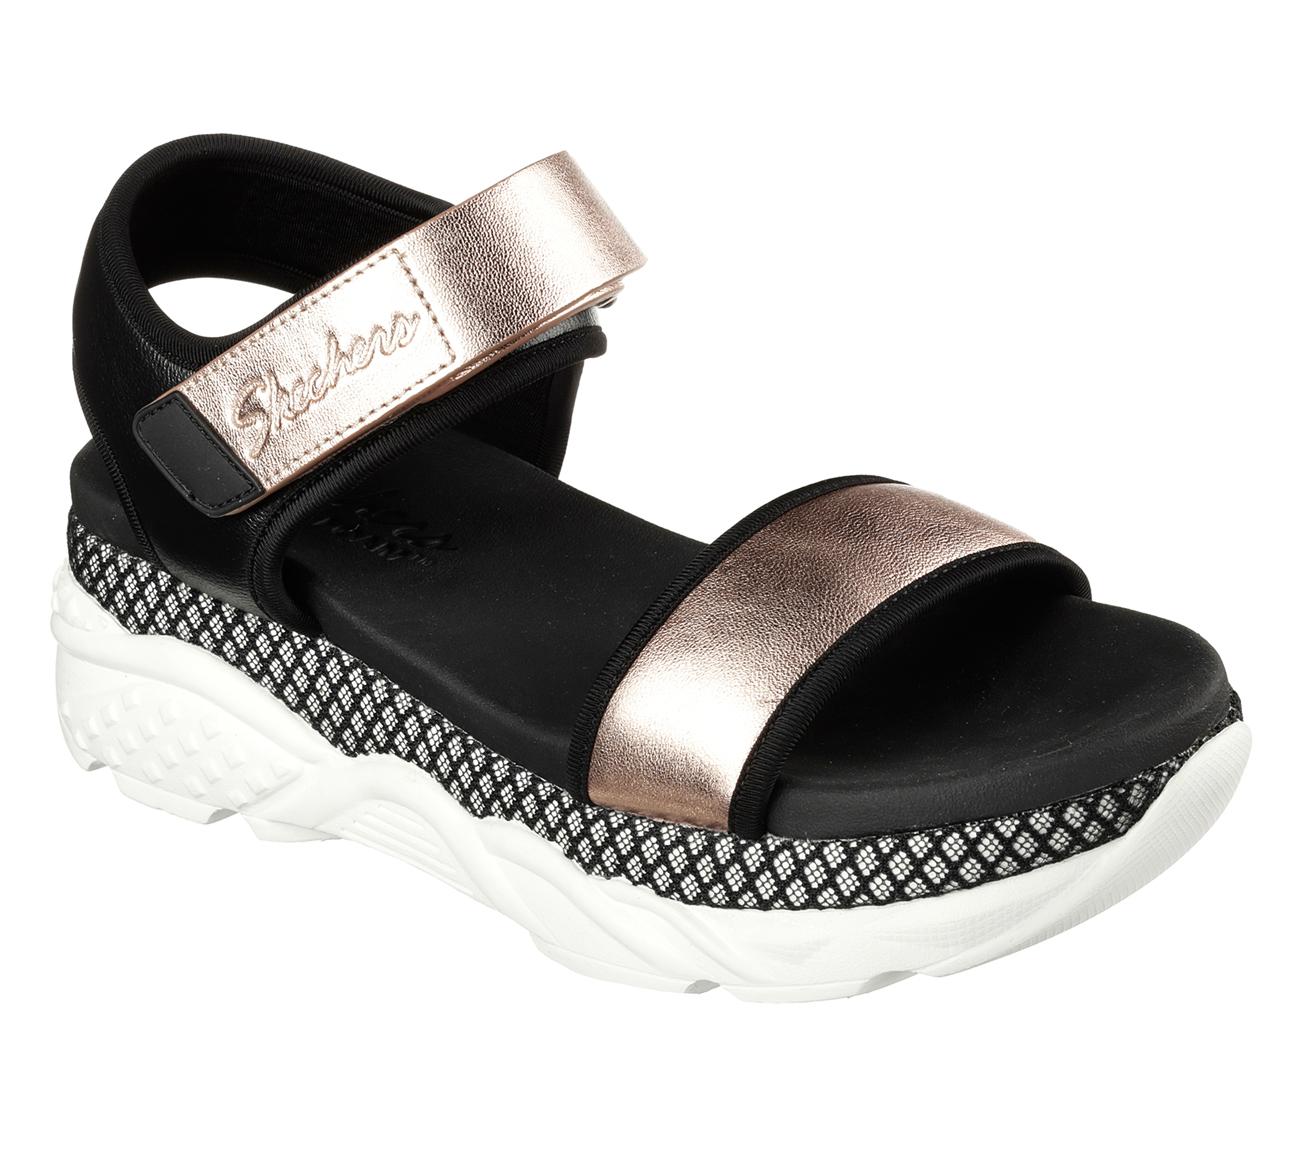 skechers yoga foam sandals